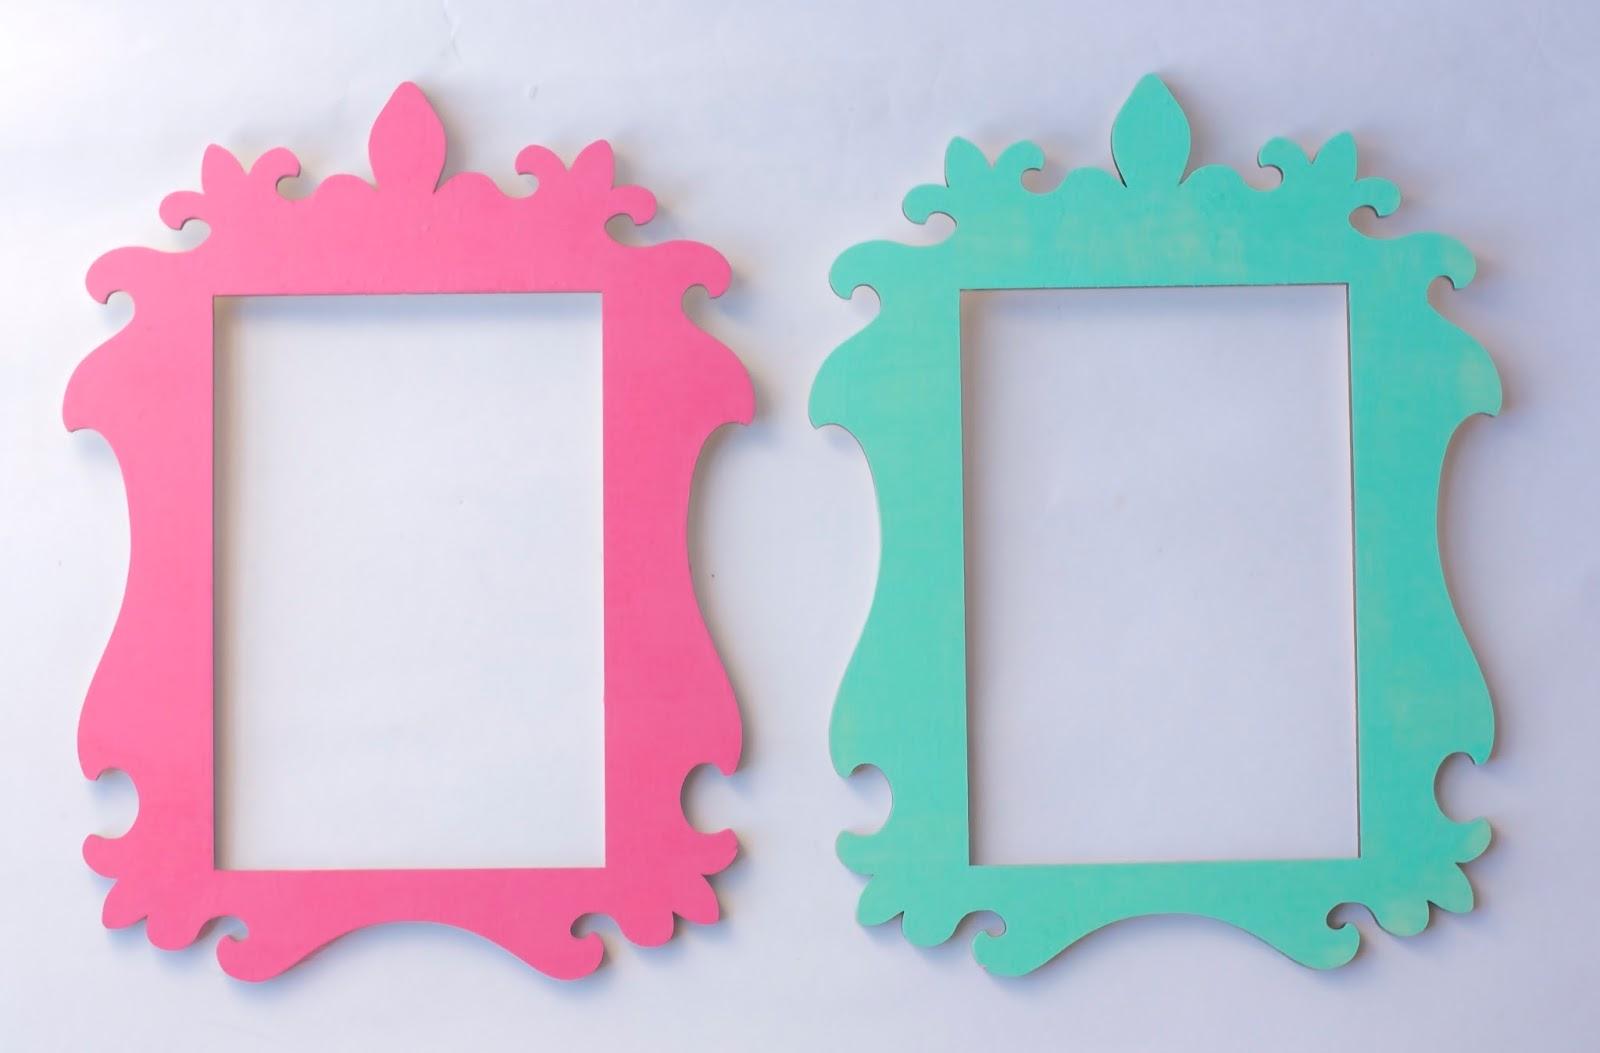 Fsn decoraci n usando maderas - Decorar marcos de madera ...